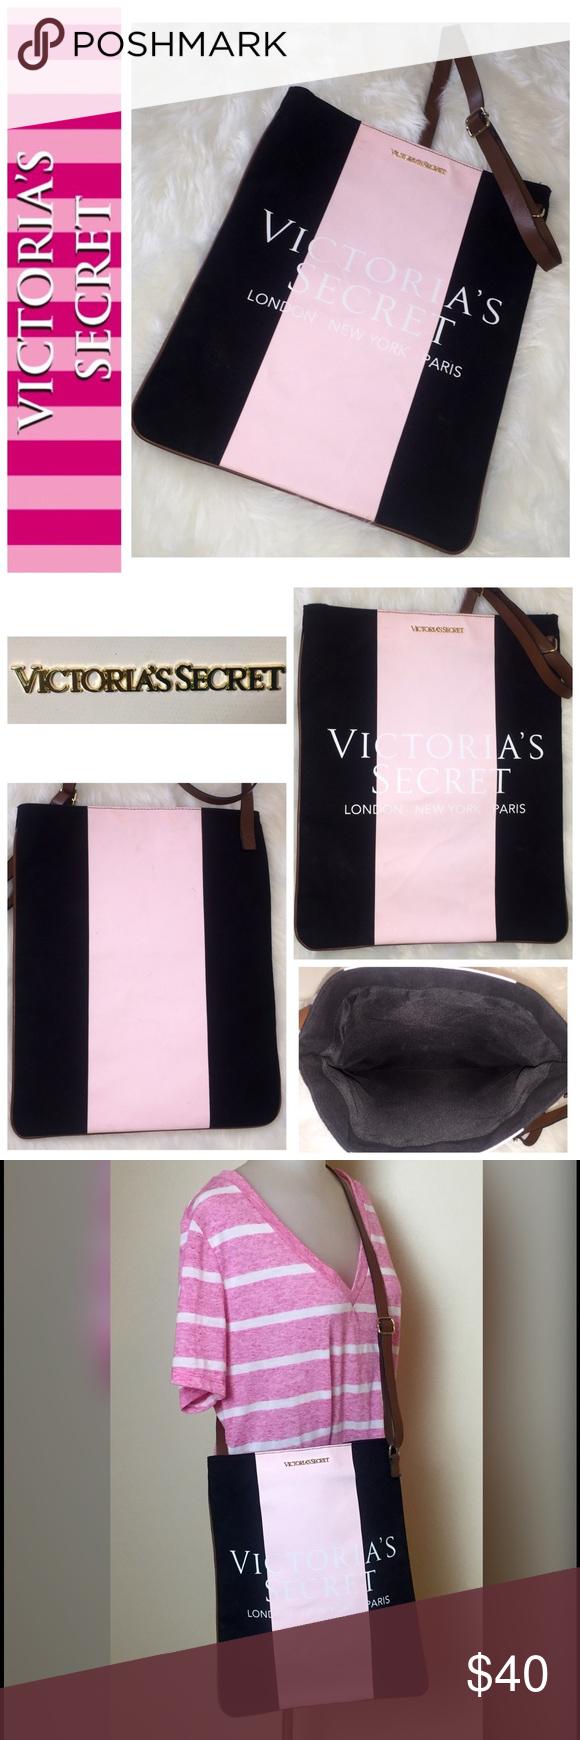 e72c035dcb993 Victoria's Secret Signature Collection Tote Bag Limited Edition ...